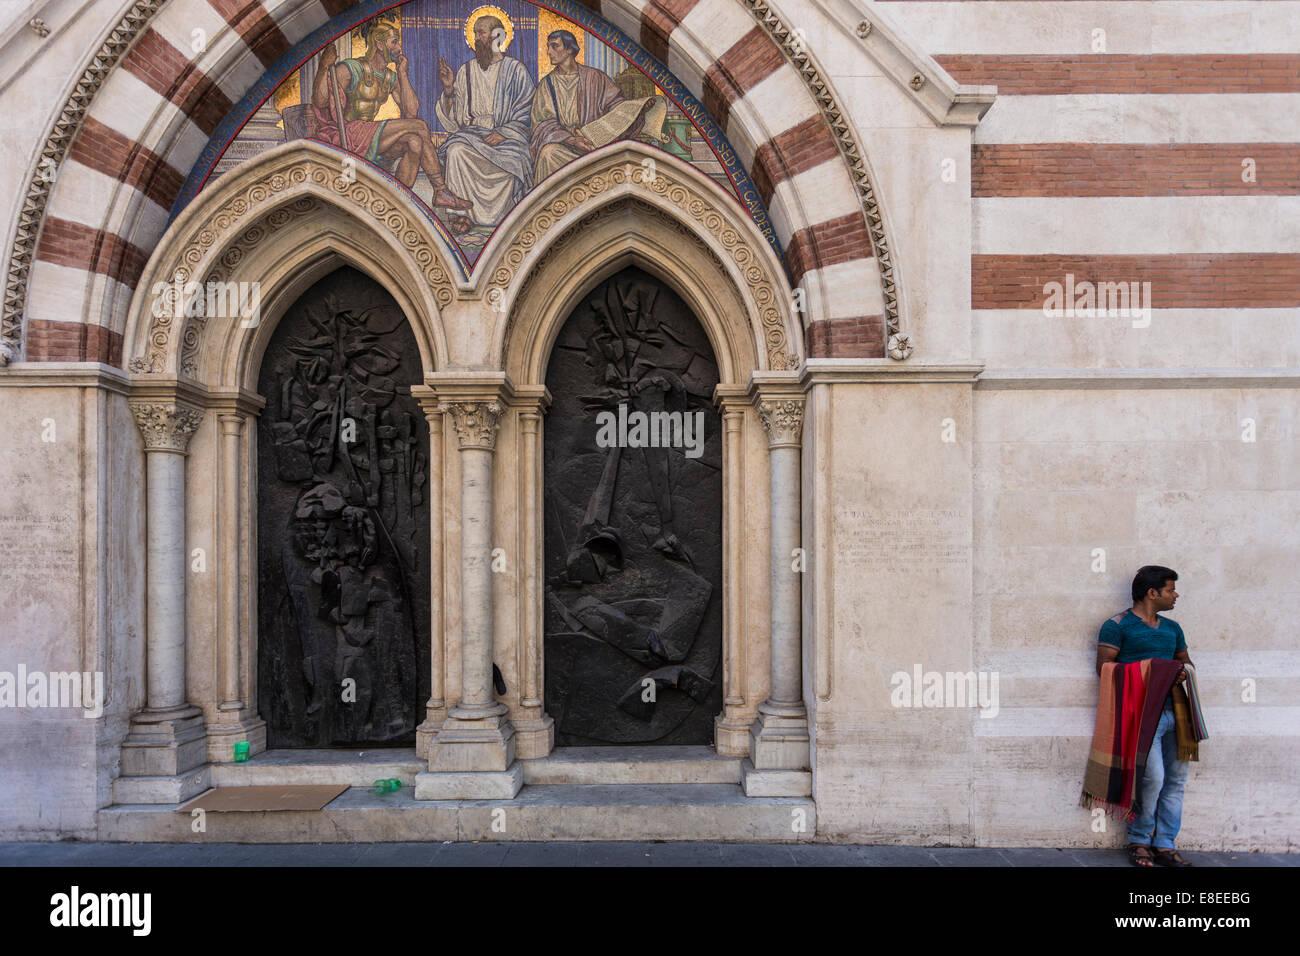 Vendor outside St Paul's Within the Walls (San Paolo dentro le mura, aka American Church in Rome), Rome, Italy Stock Photo